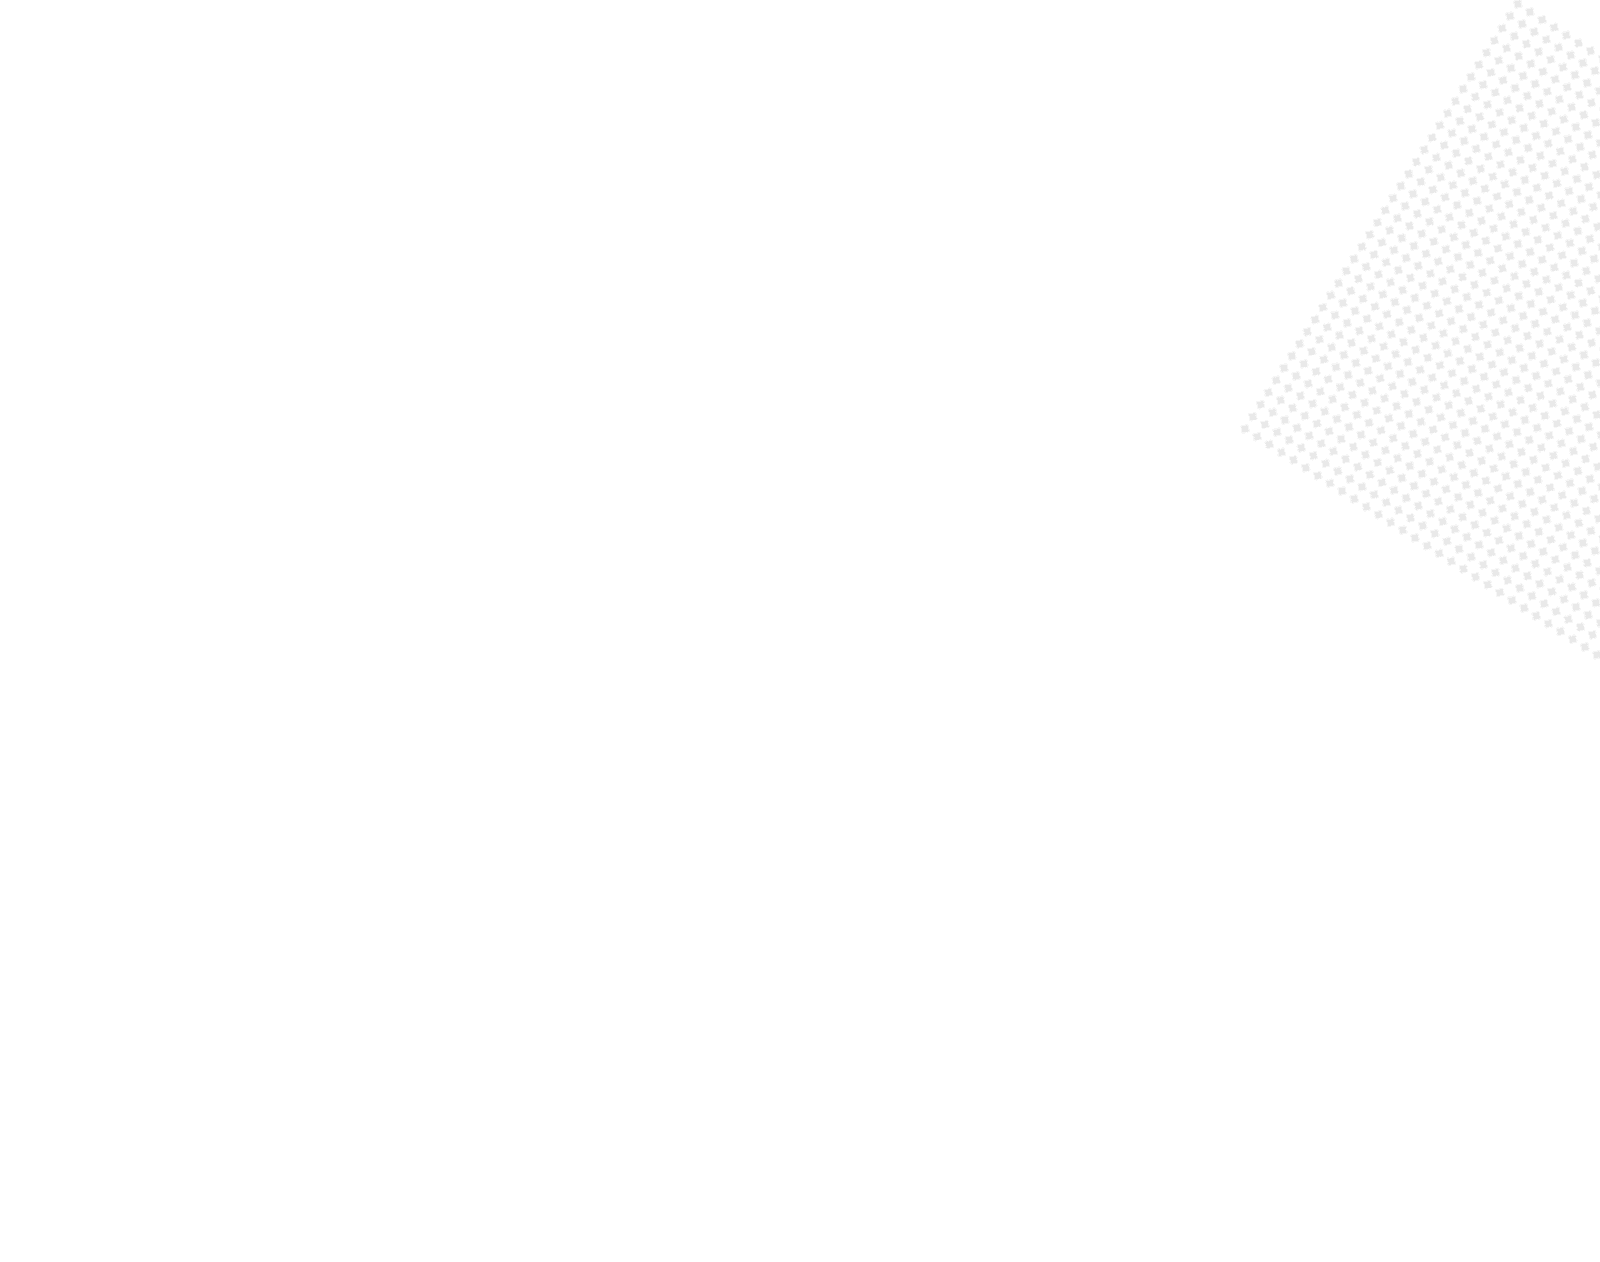 Home-Seven-Solution-Background-Image